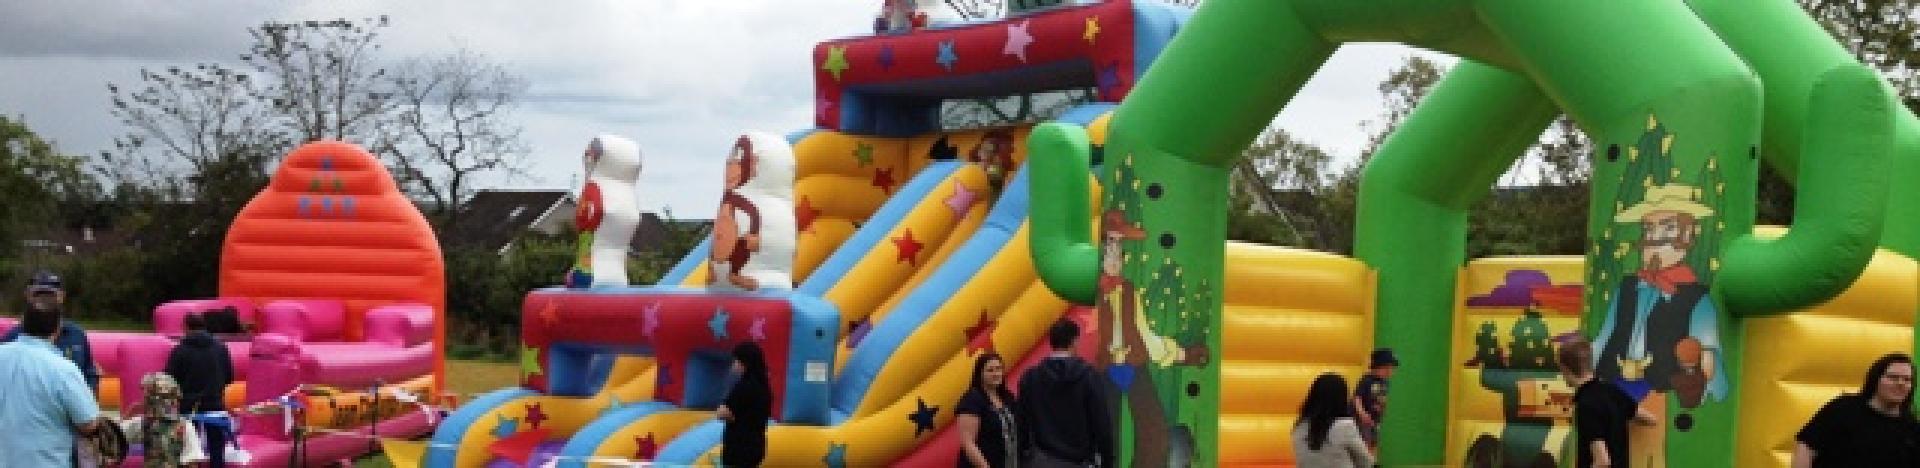 Corporate Family Fun Day